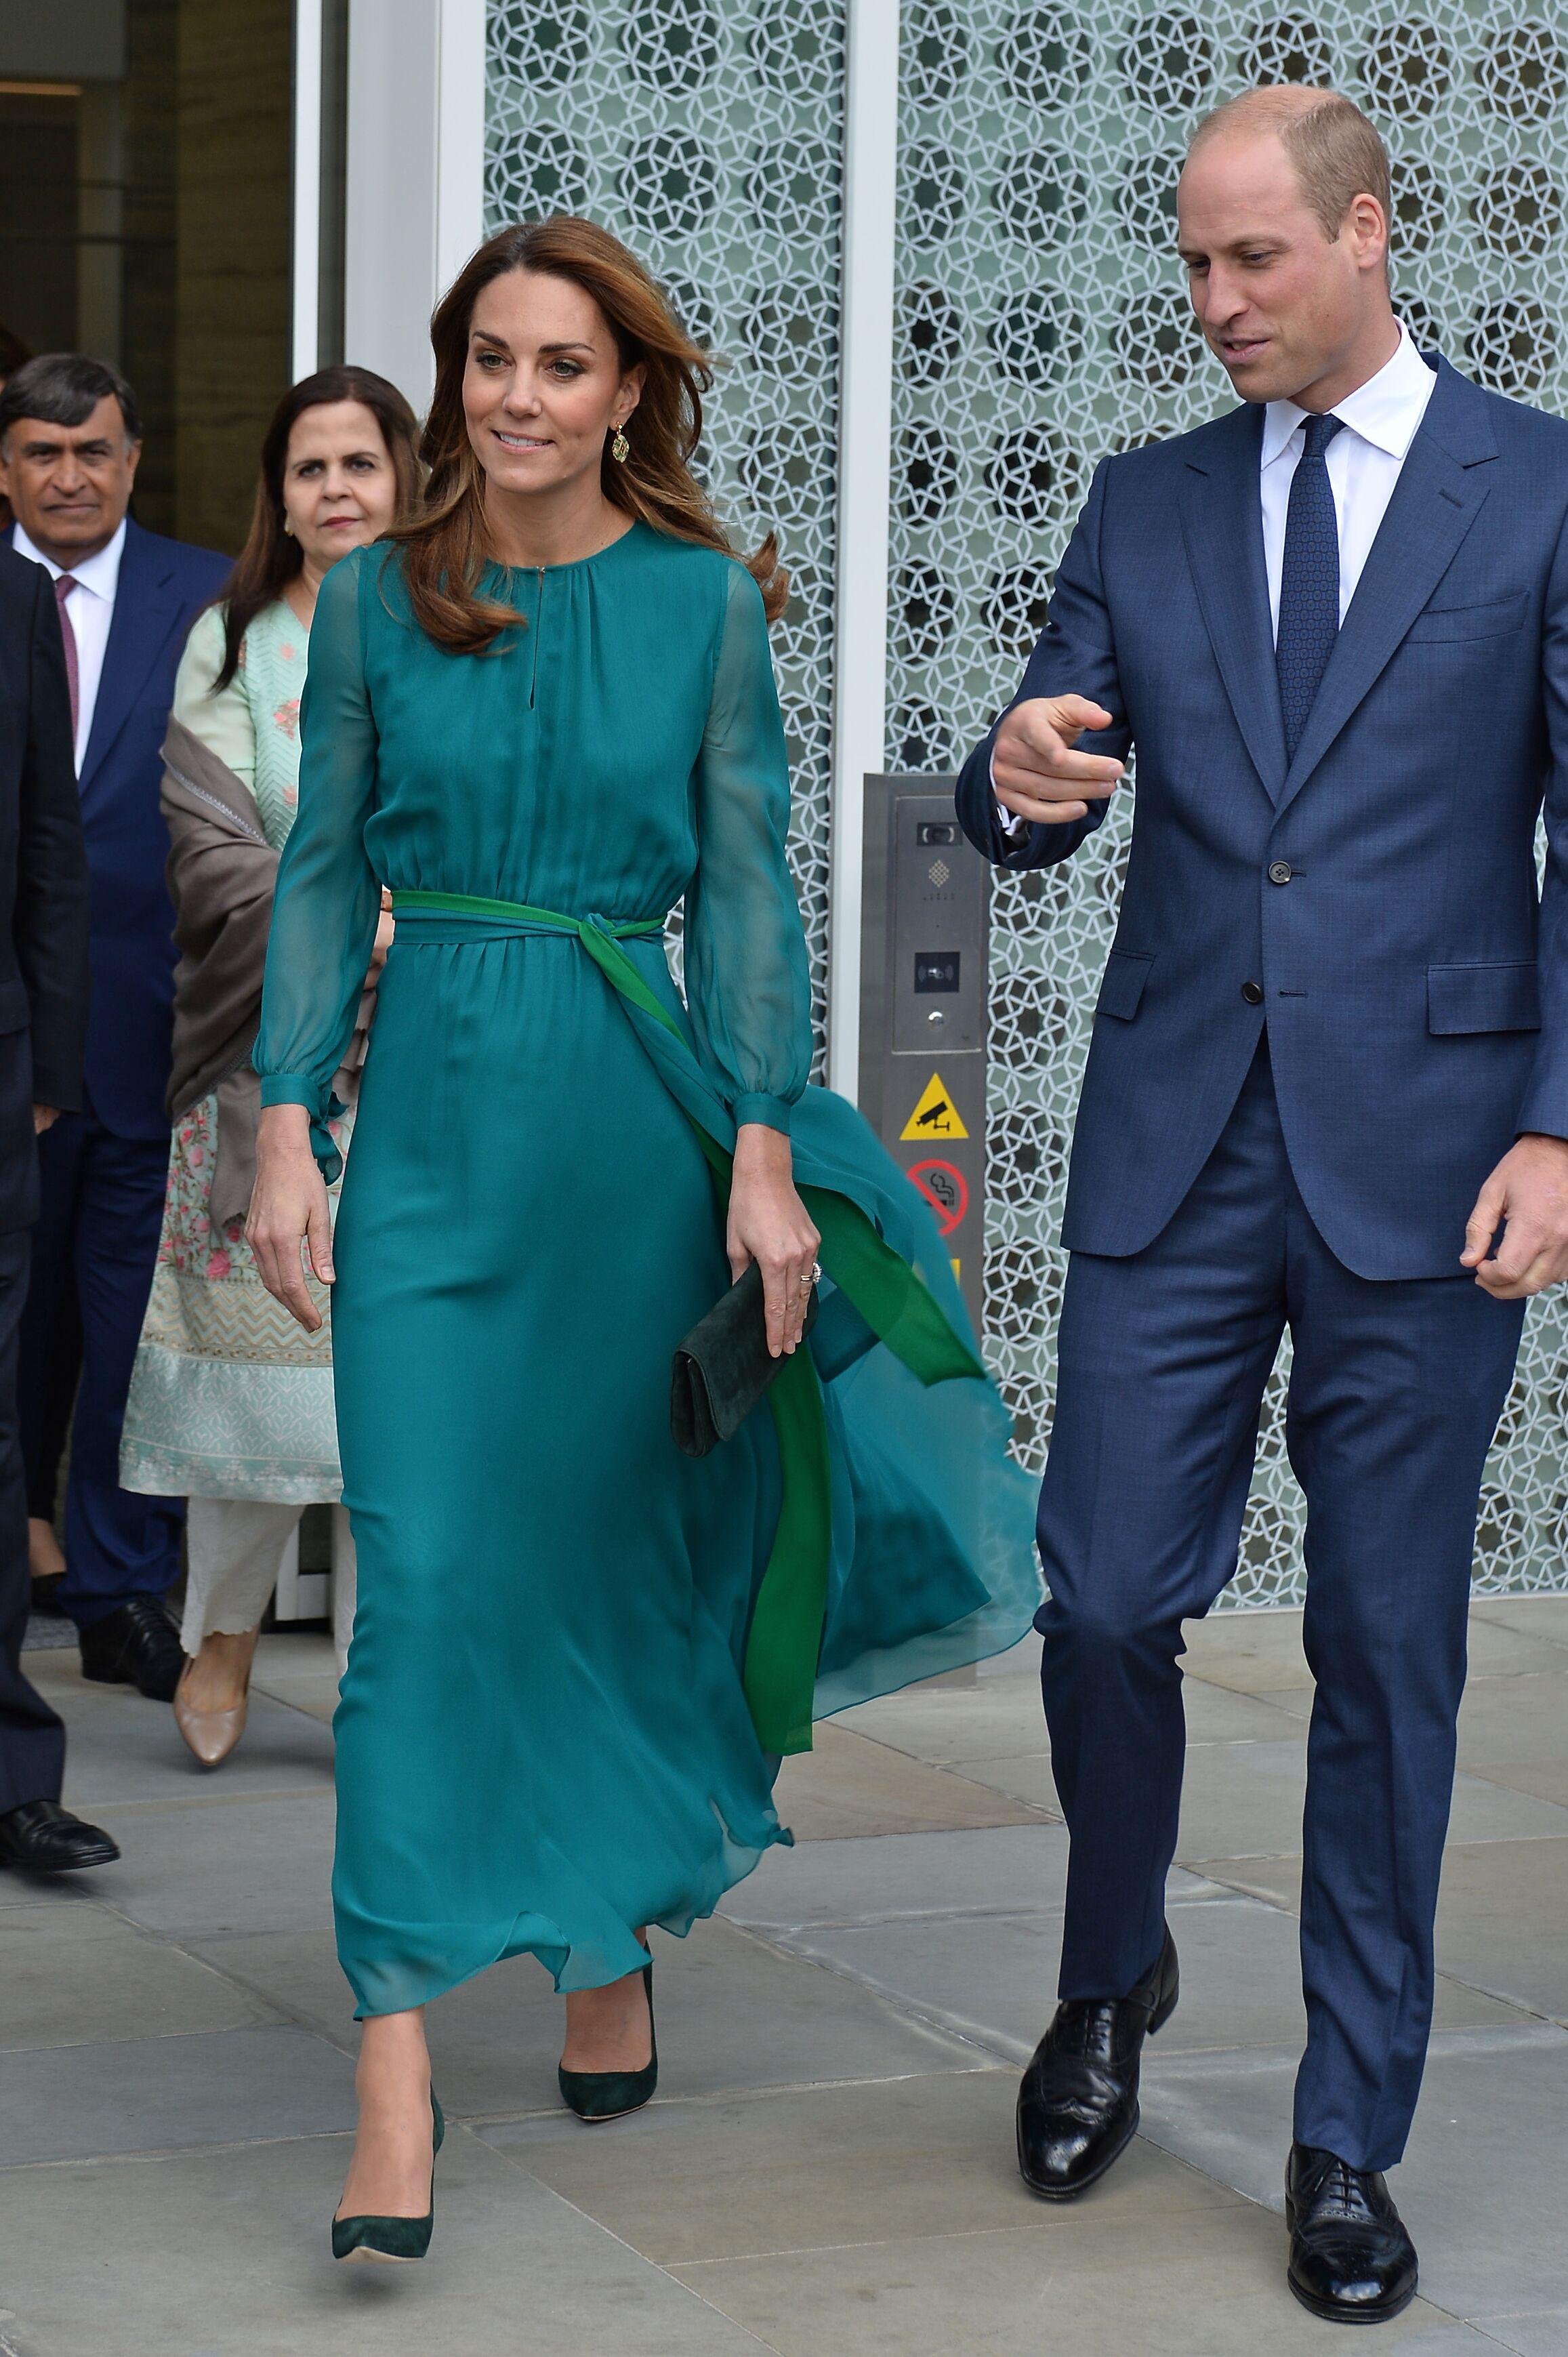 Le Prince William et Kate Middleton visitent le Centre Aga Khan. | Source : Getty Images